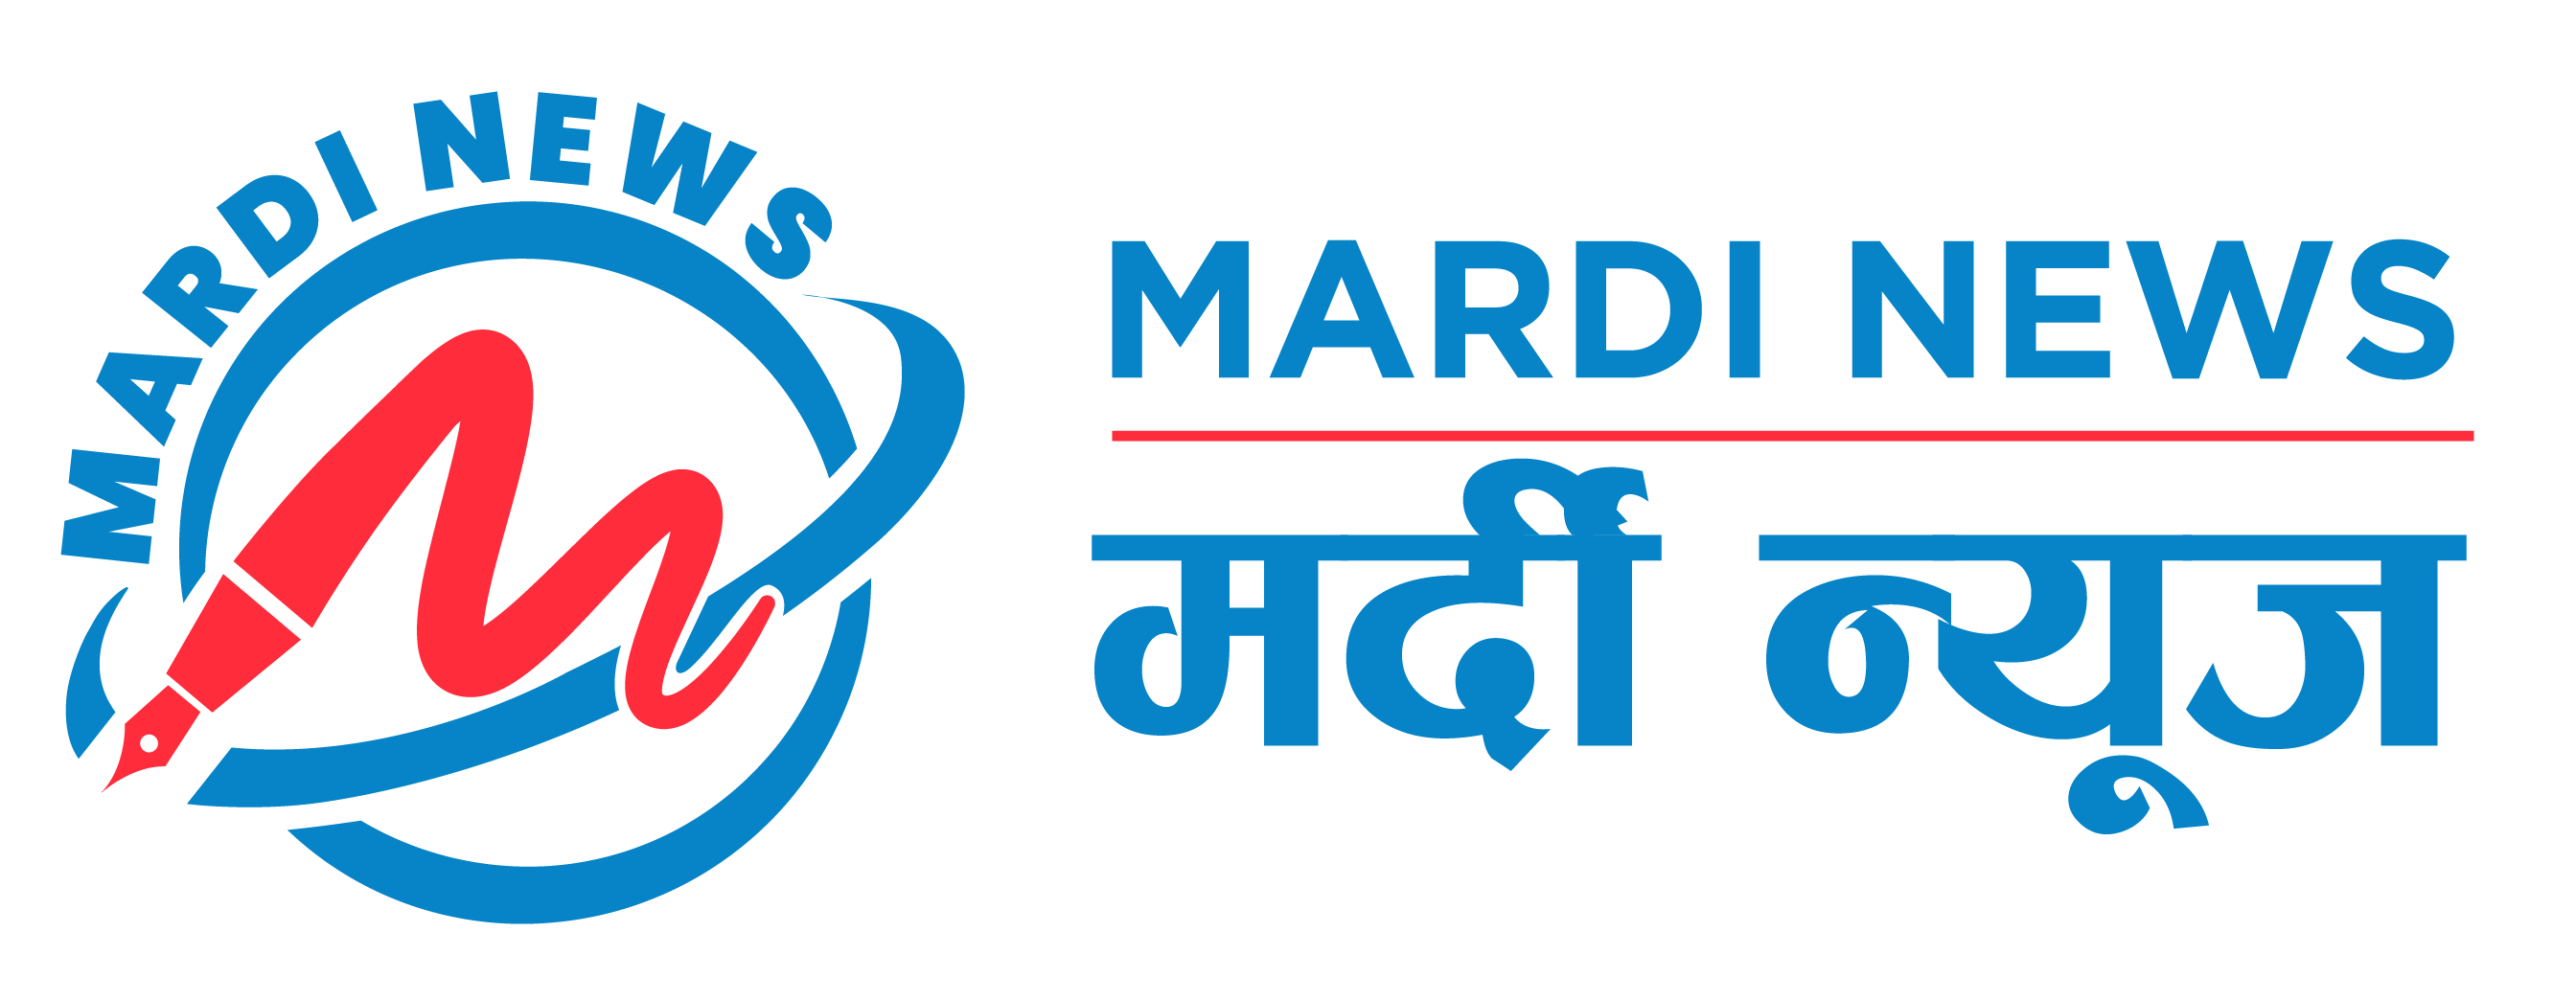 Mardi News